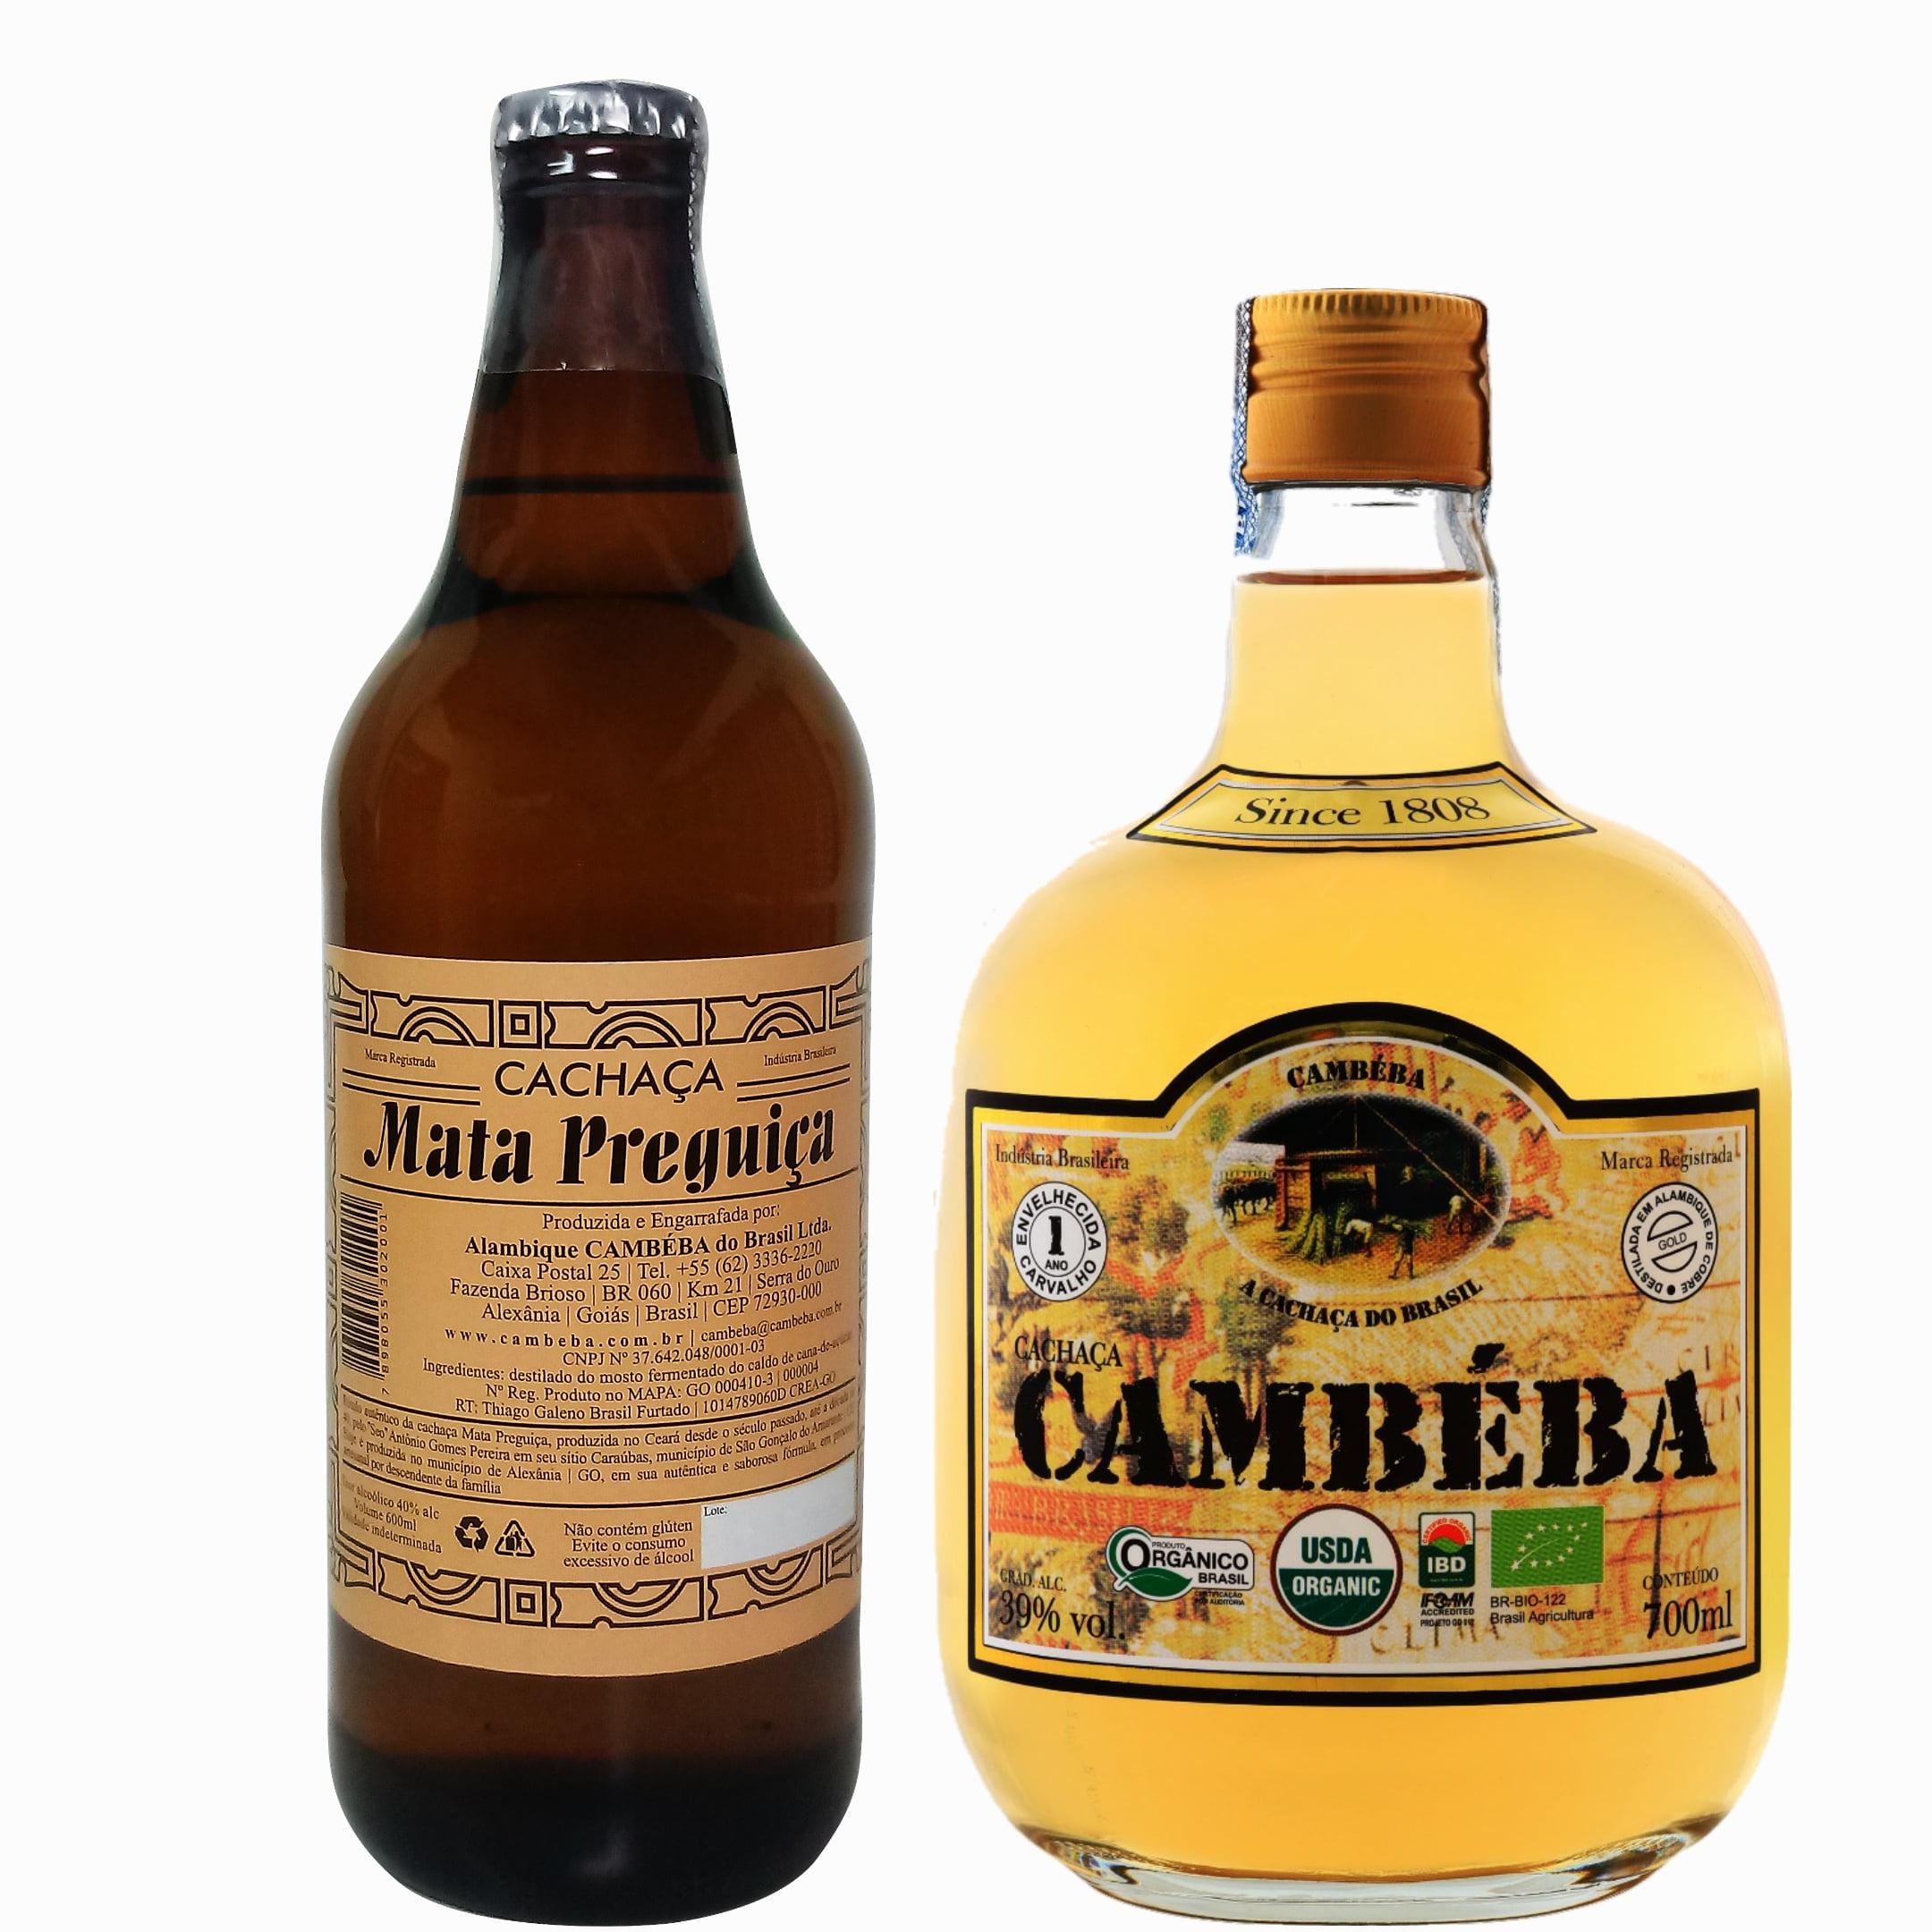 Kit Cachaça Mata Preguiça 600ml e Cambéba Envelhecida 700 ml